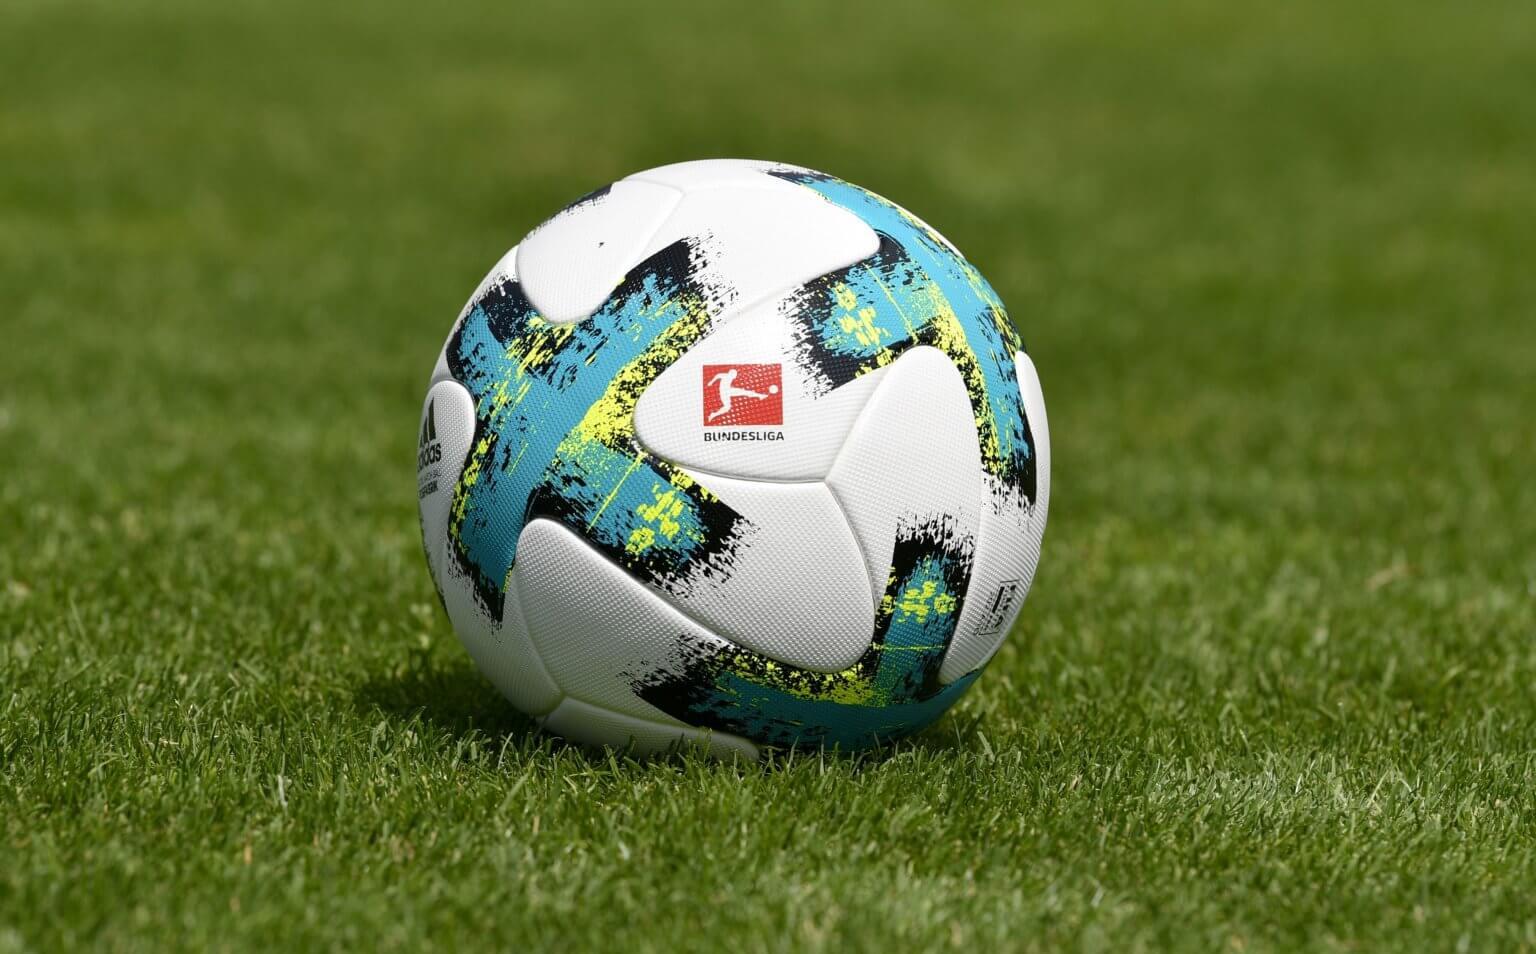 Bundesliga returns to action